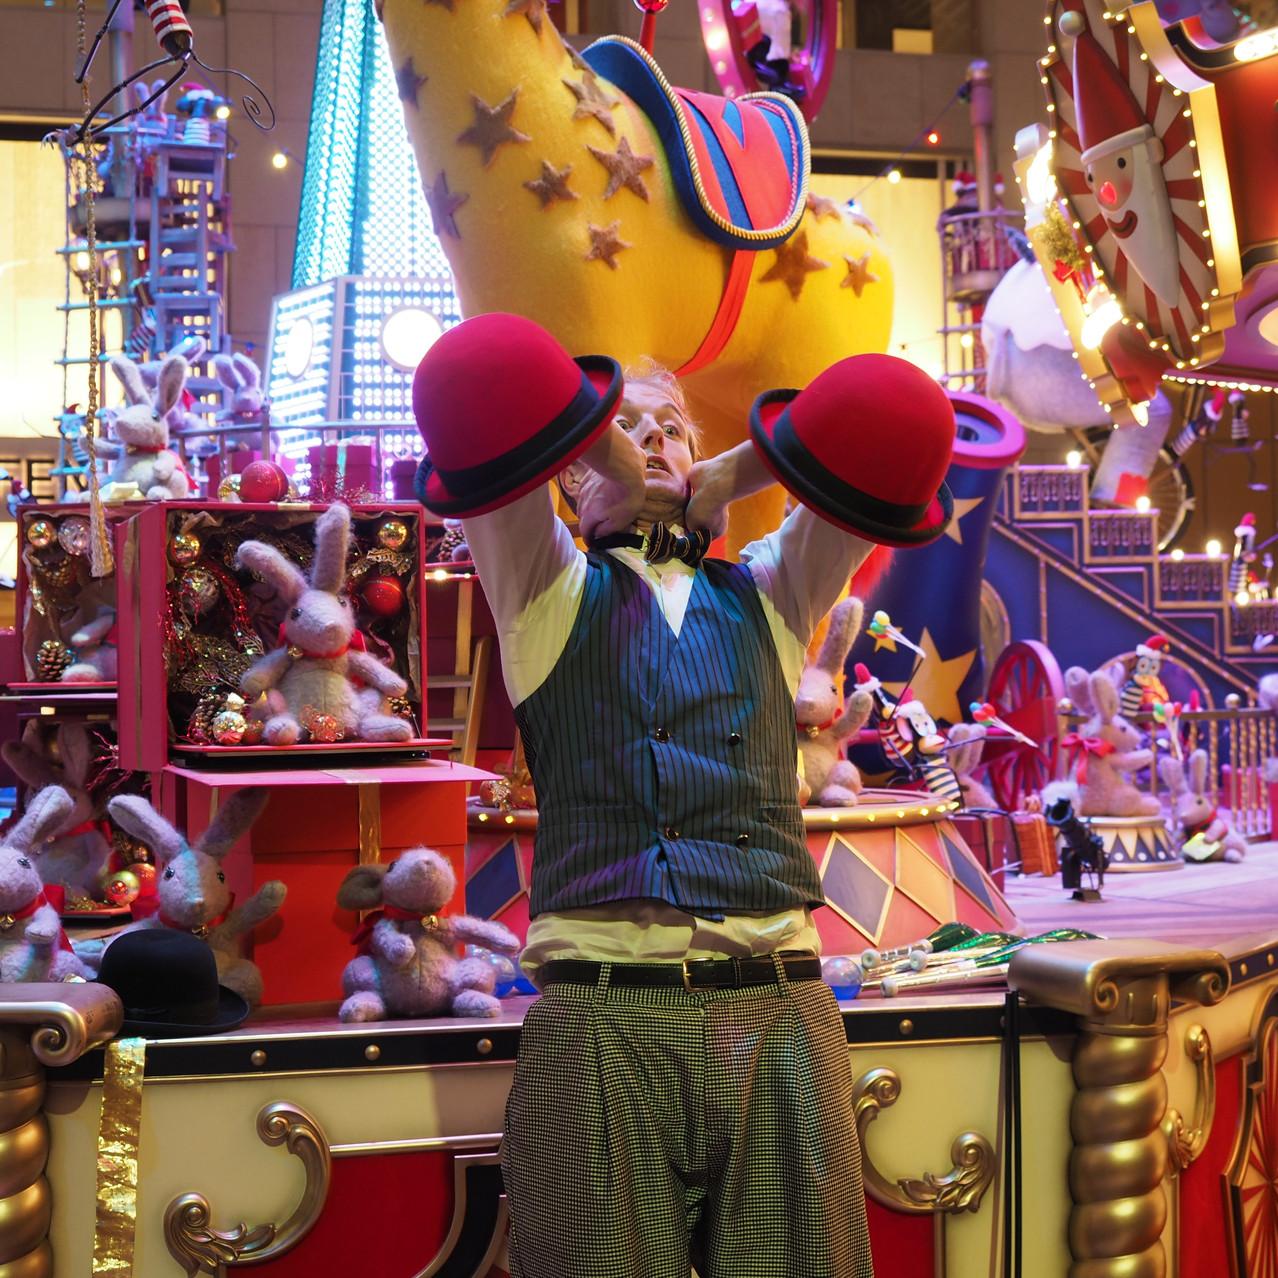 Professional circus performer